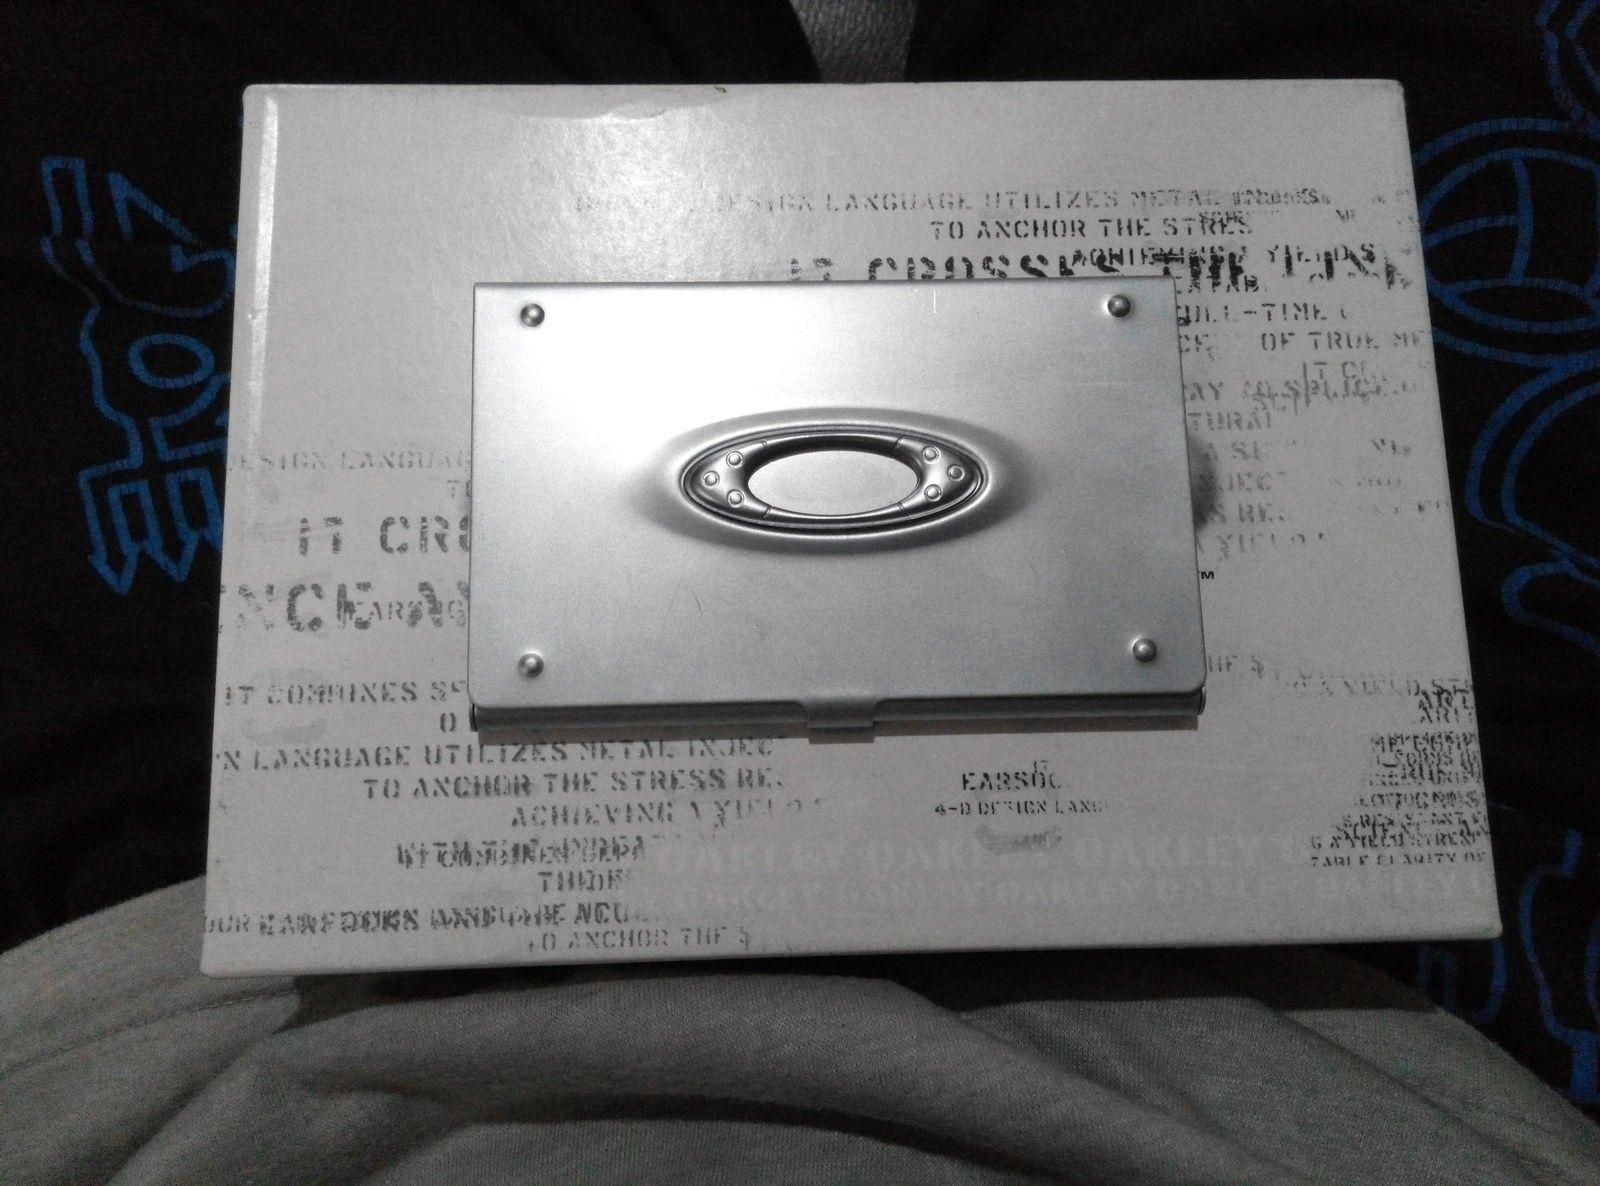 Oakley icon business card case silver - IMG_20150112_170340.jpg